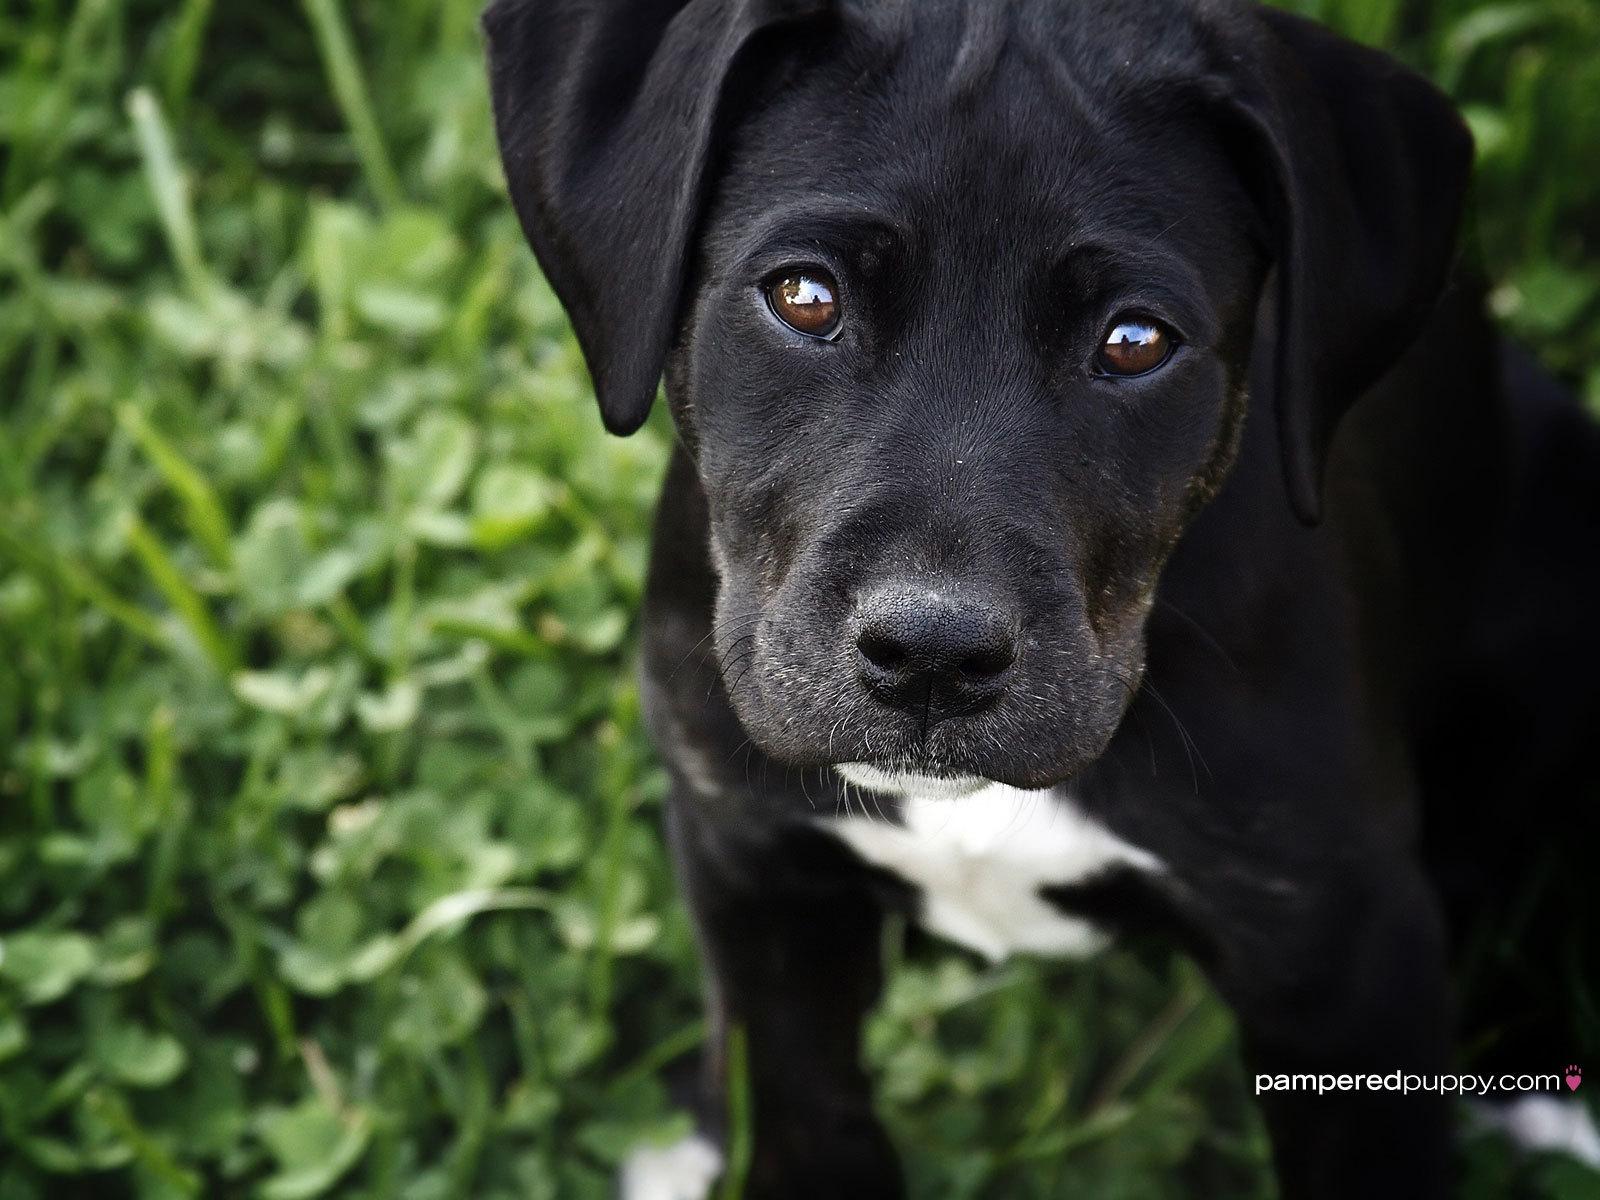 Black Labrador Retriever puppy   Dogs Wallpaper 13518444 1600x1200